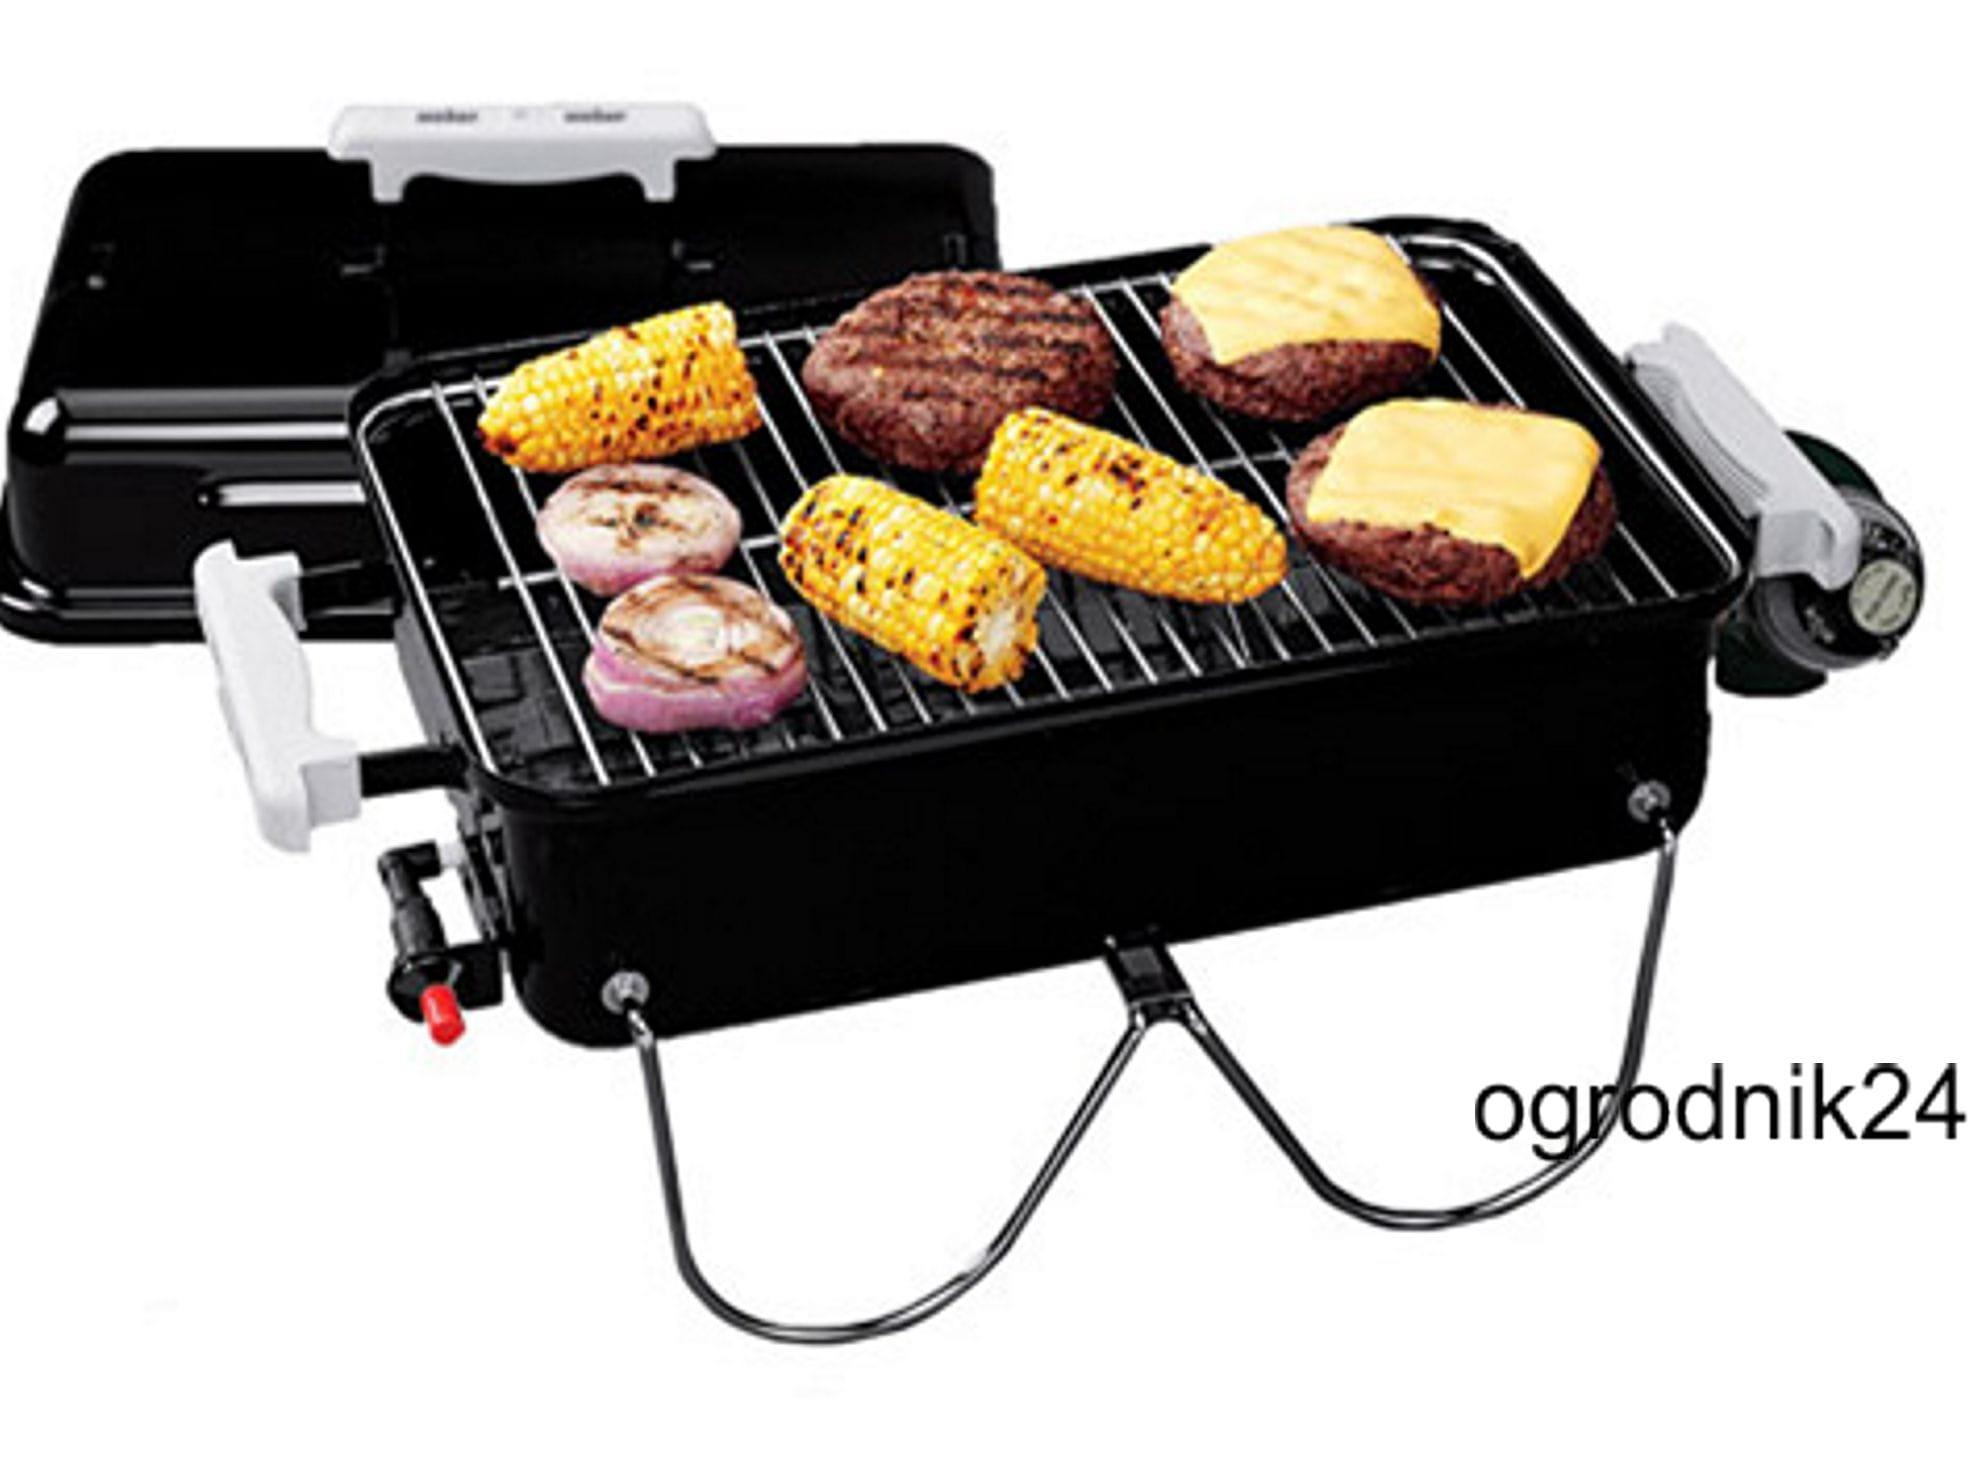 weber bbq grill weber gourmet bbq system 100 weber grill guide weber q electric grill. Black Bedroom Furniture Sets. Home Design Ideas